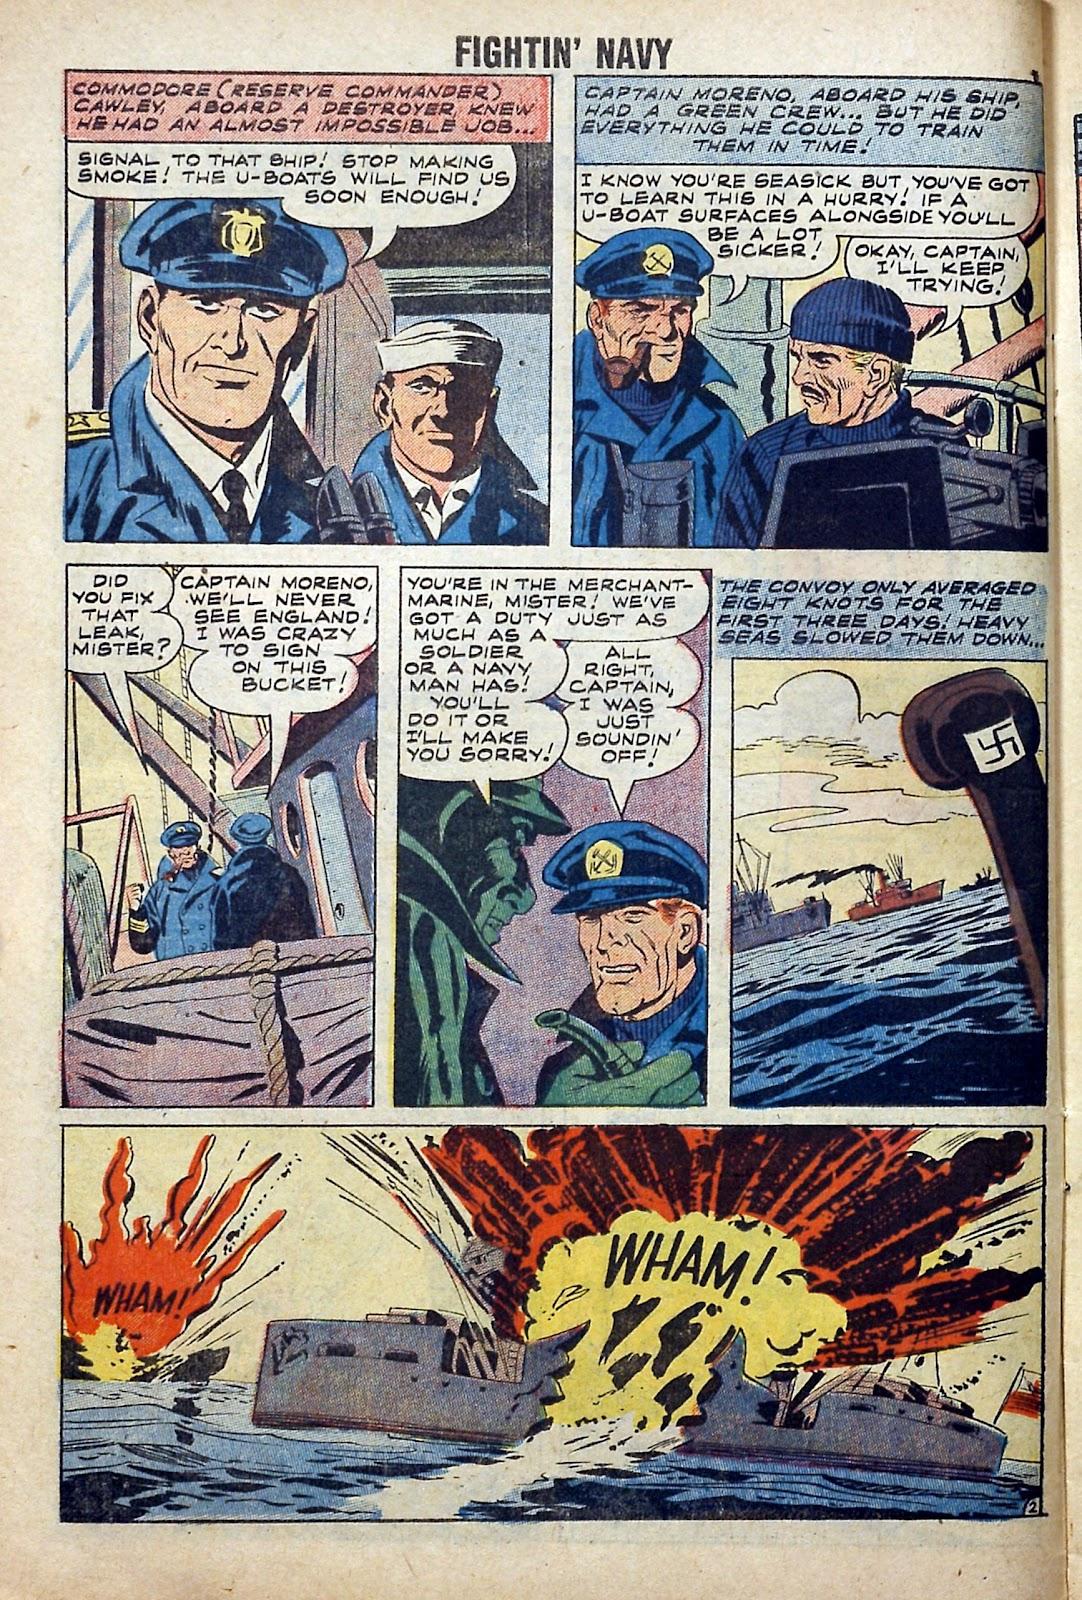 Read online Fightin' Navy comic -  Issue #84 - 10